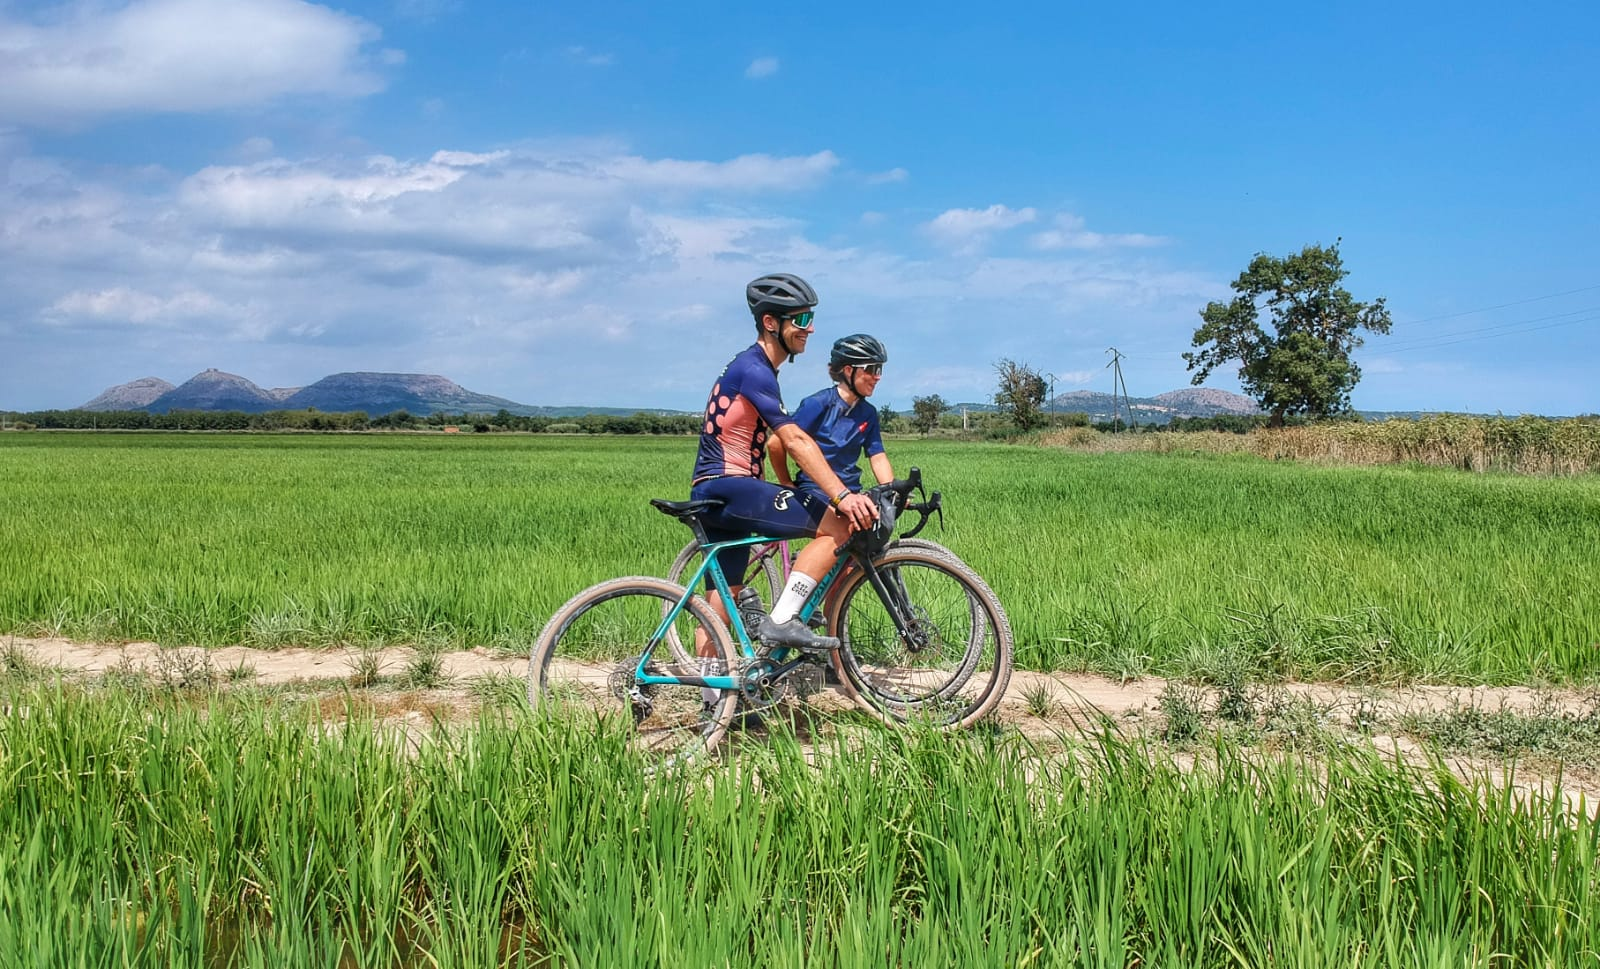 Costa-Brava-Girona-Gravel-Tour-Bike-Eat-Sleep-Cycle